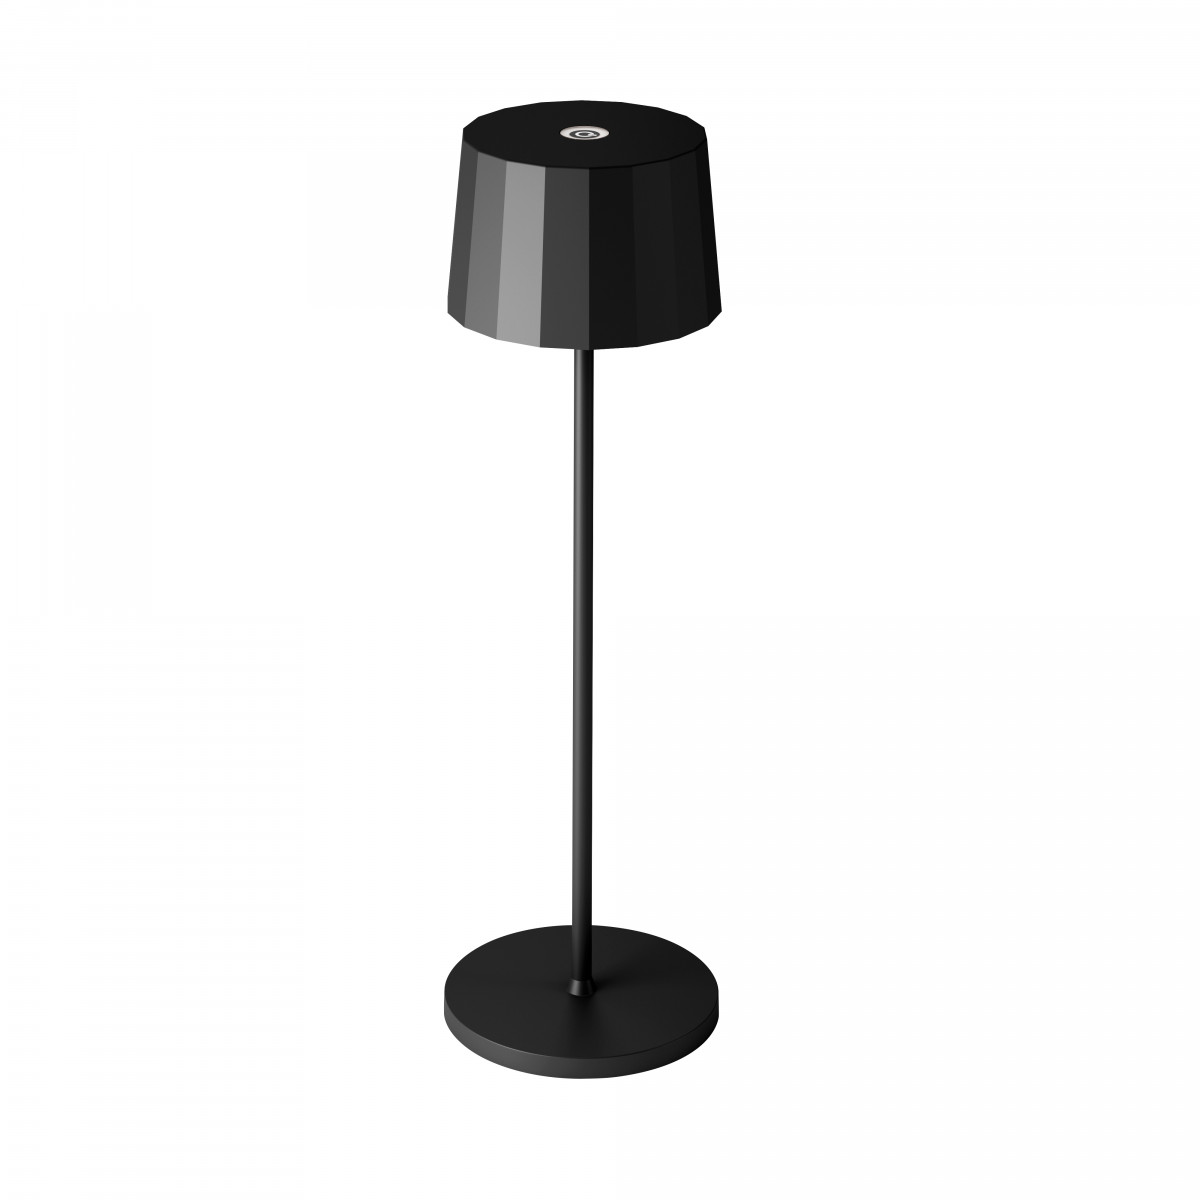 Tafellamp Lido Touch zwart met USB